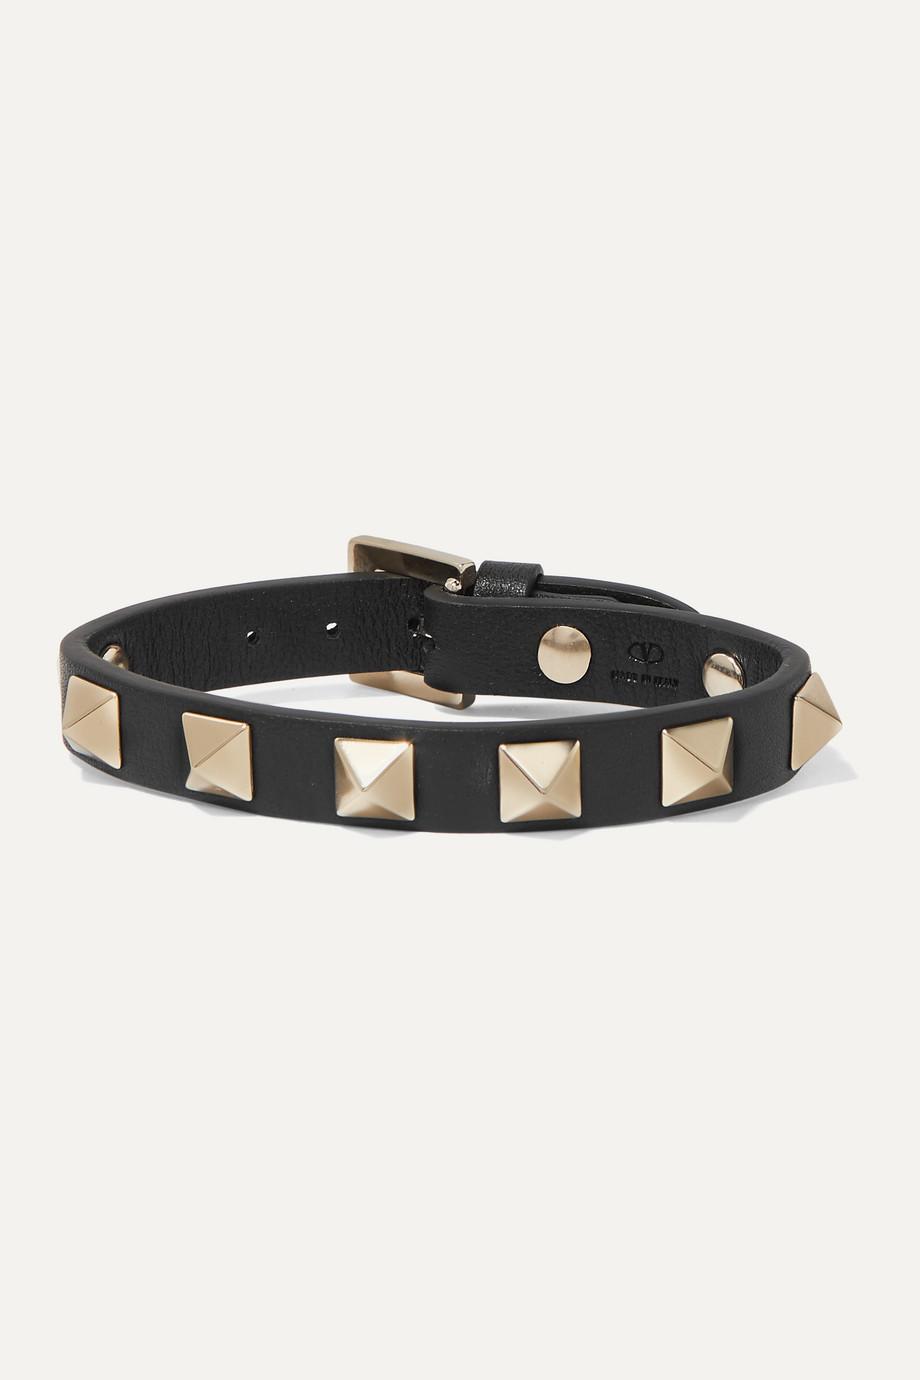 Valentino Valentino Garavani The Rockstud leather bracelet